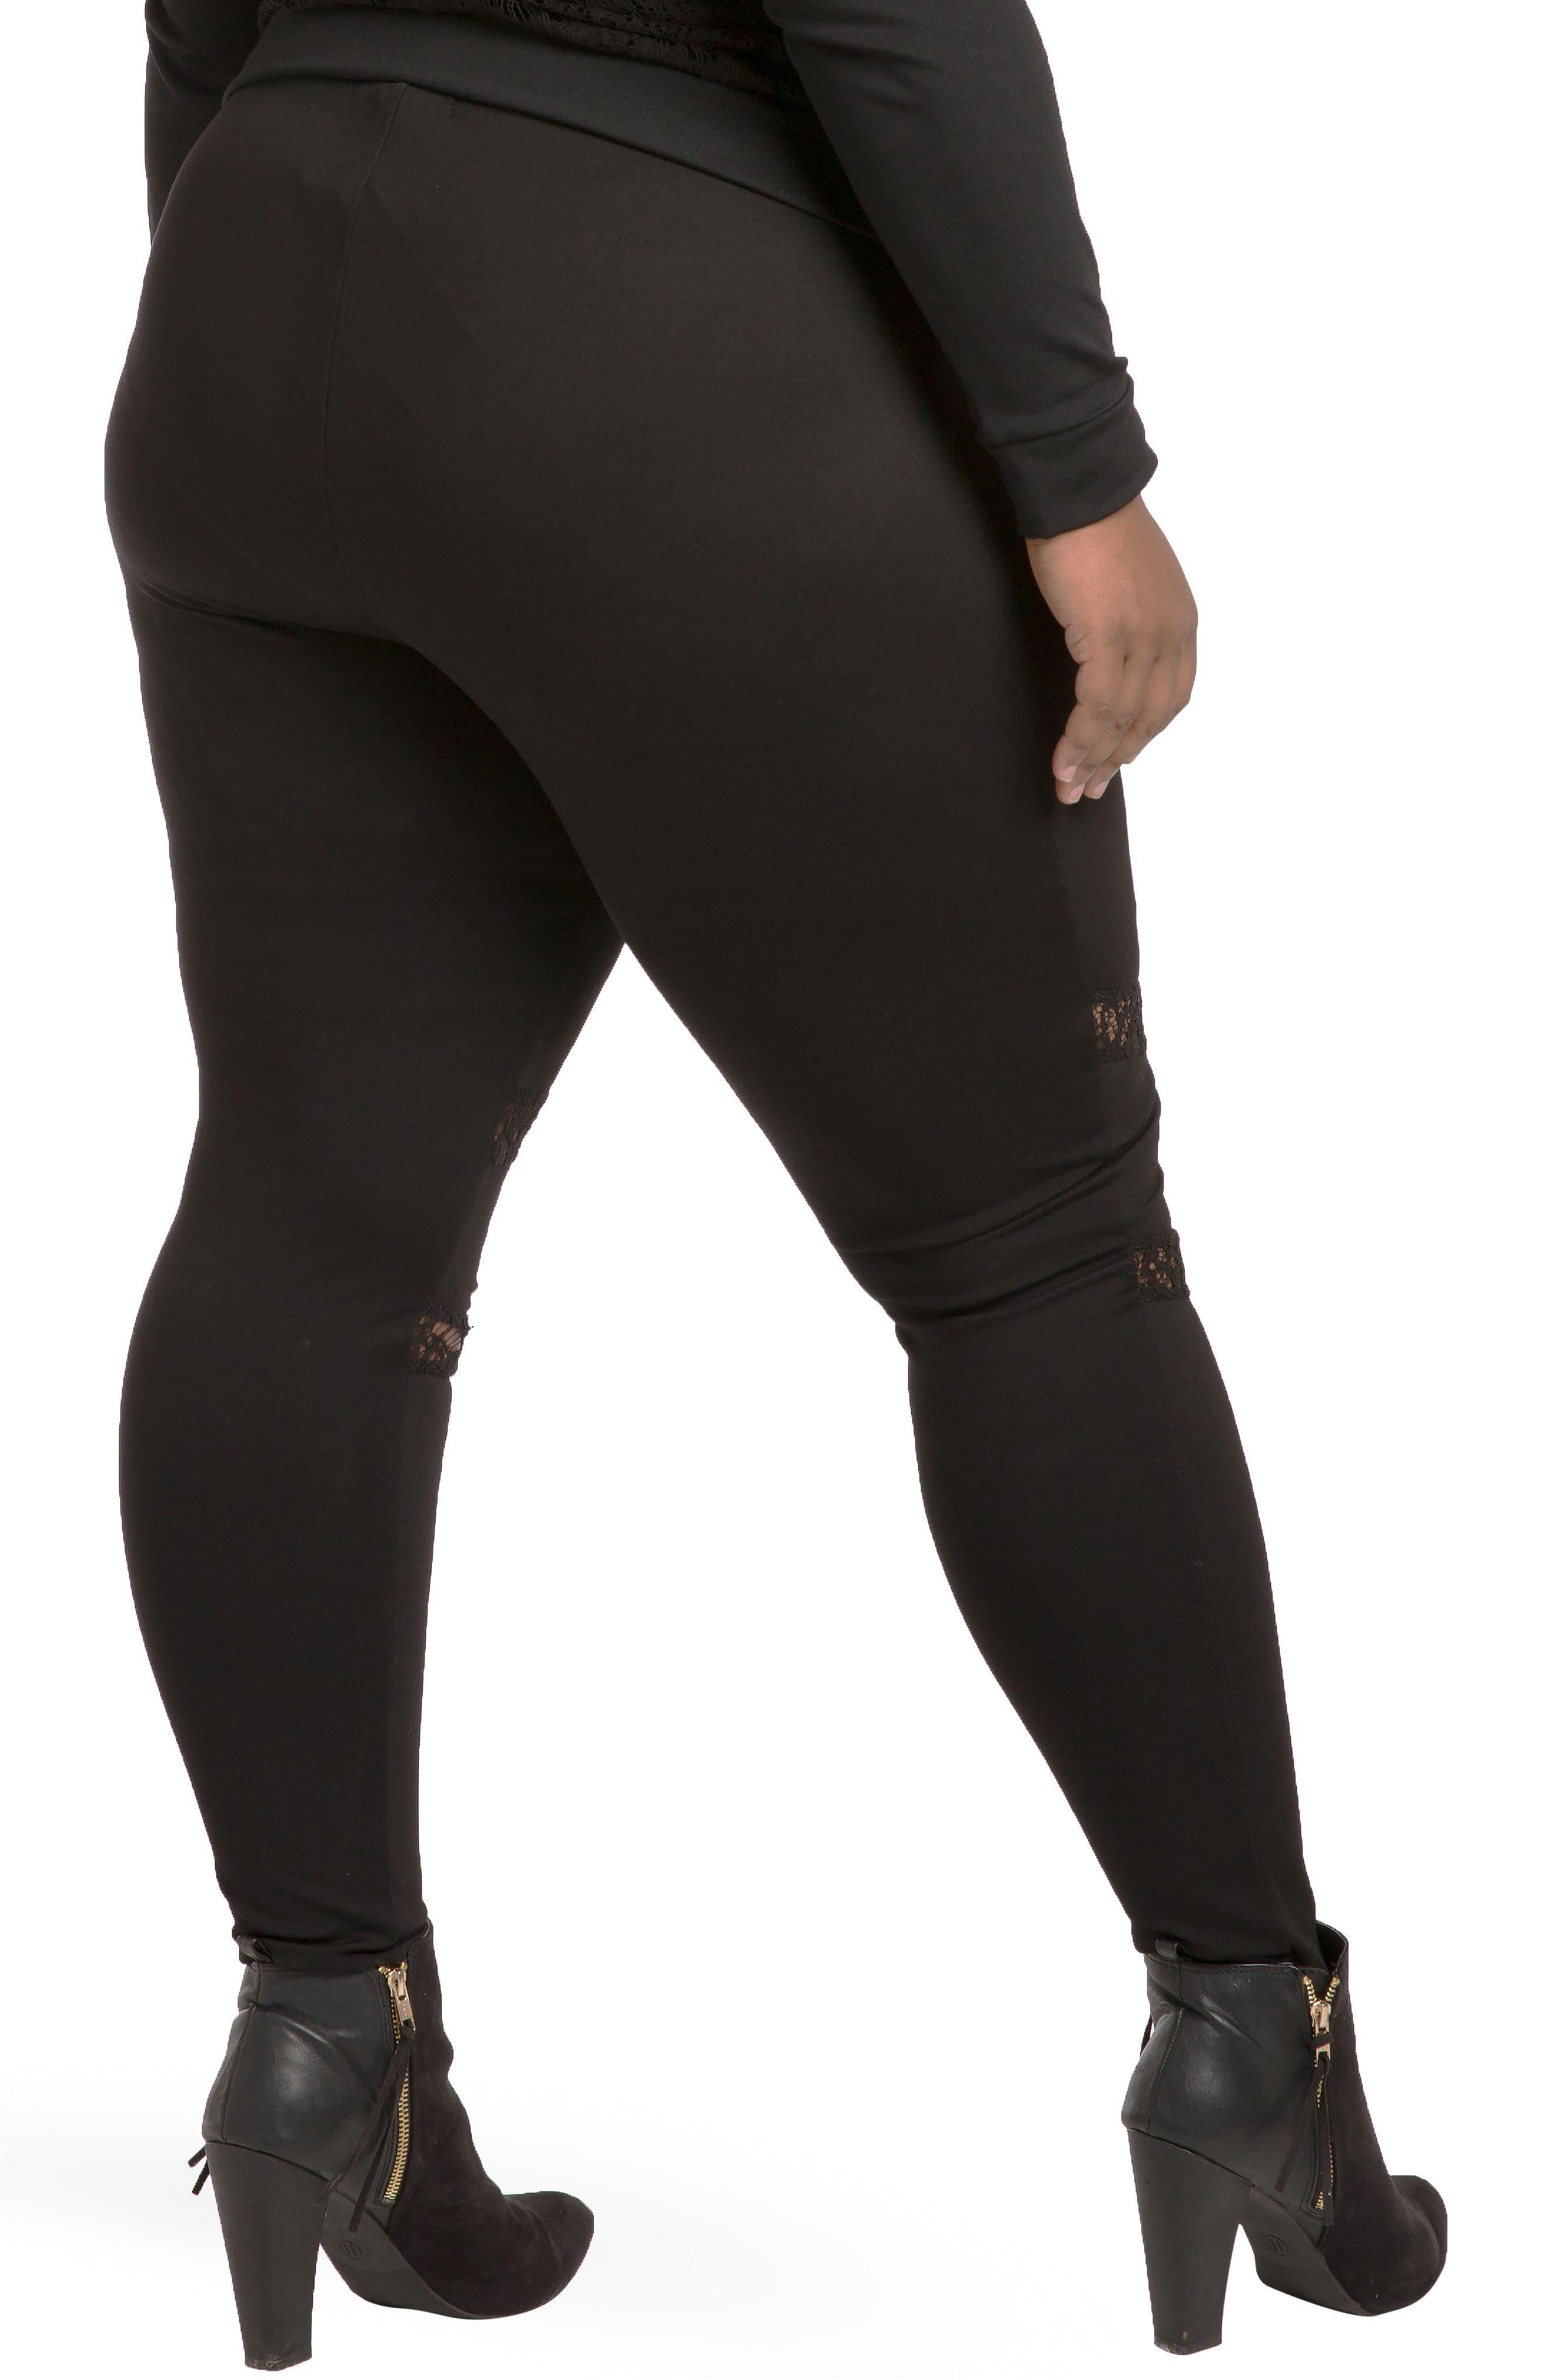 Janet Curvy Fit Leggings,                             Alternate thumbnail 4, color,                             Black